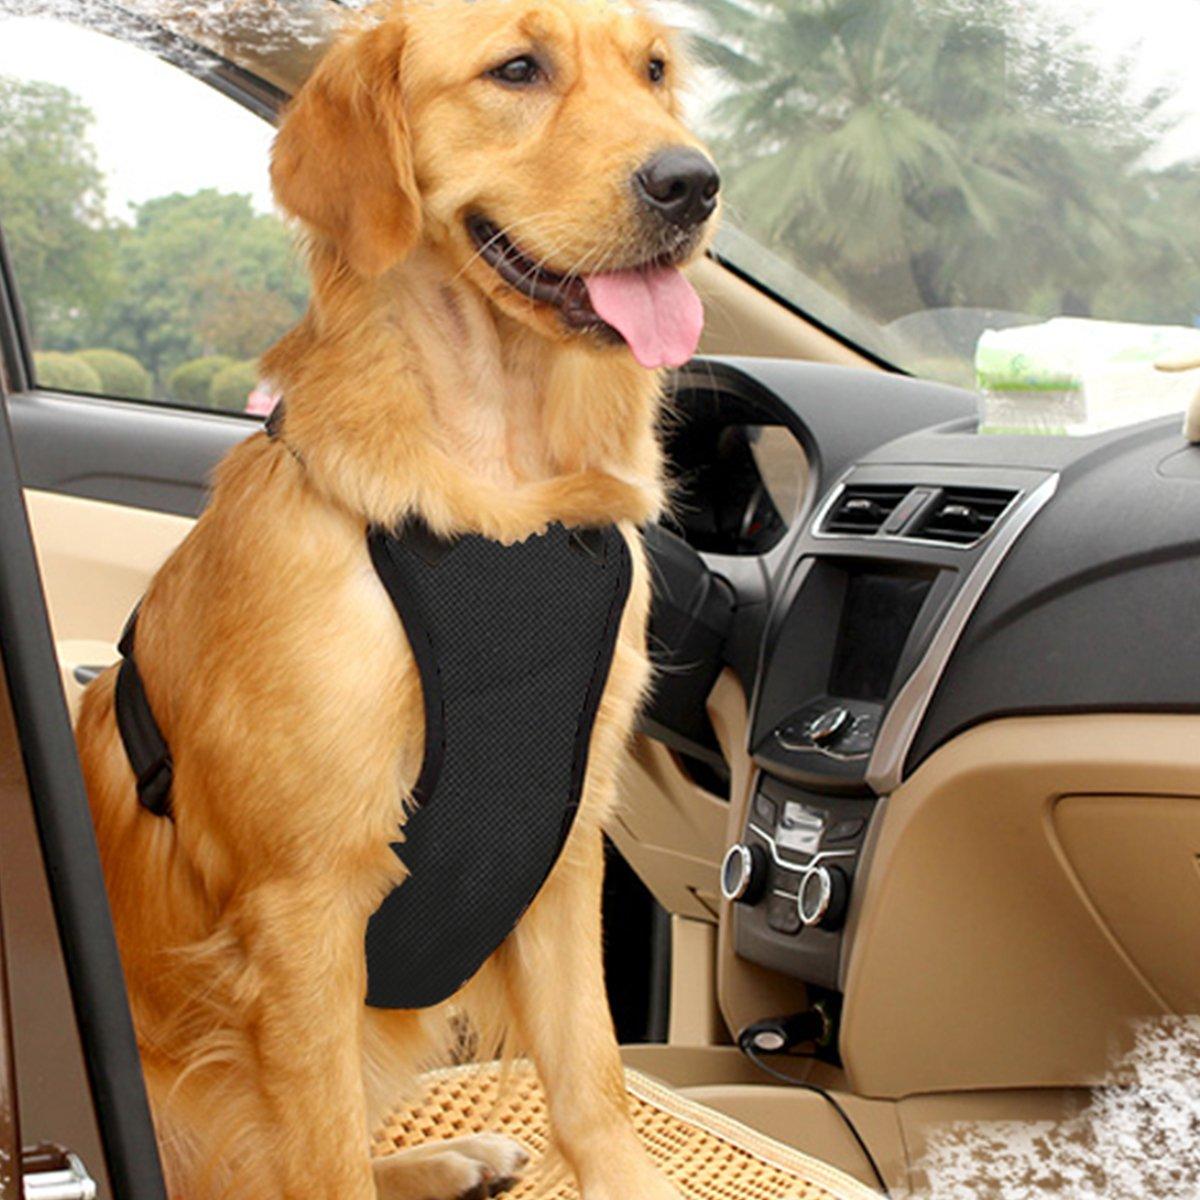 EAST-BIRD Dog Safety Vest Harness with Safety Belt for Most Car, Travel Strap Vest with Car Seat Belt Lead Adjustable Lightweight and Comfortable (XL, Black)